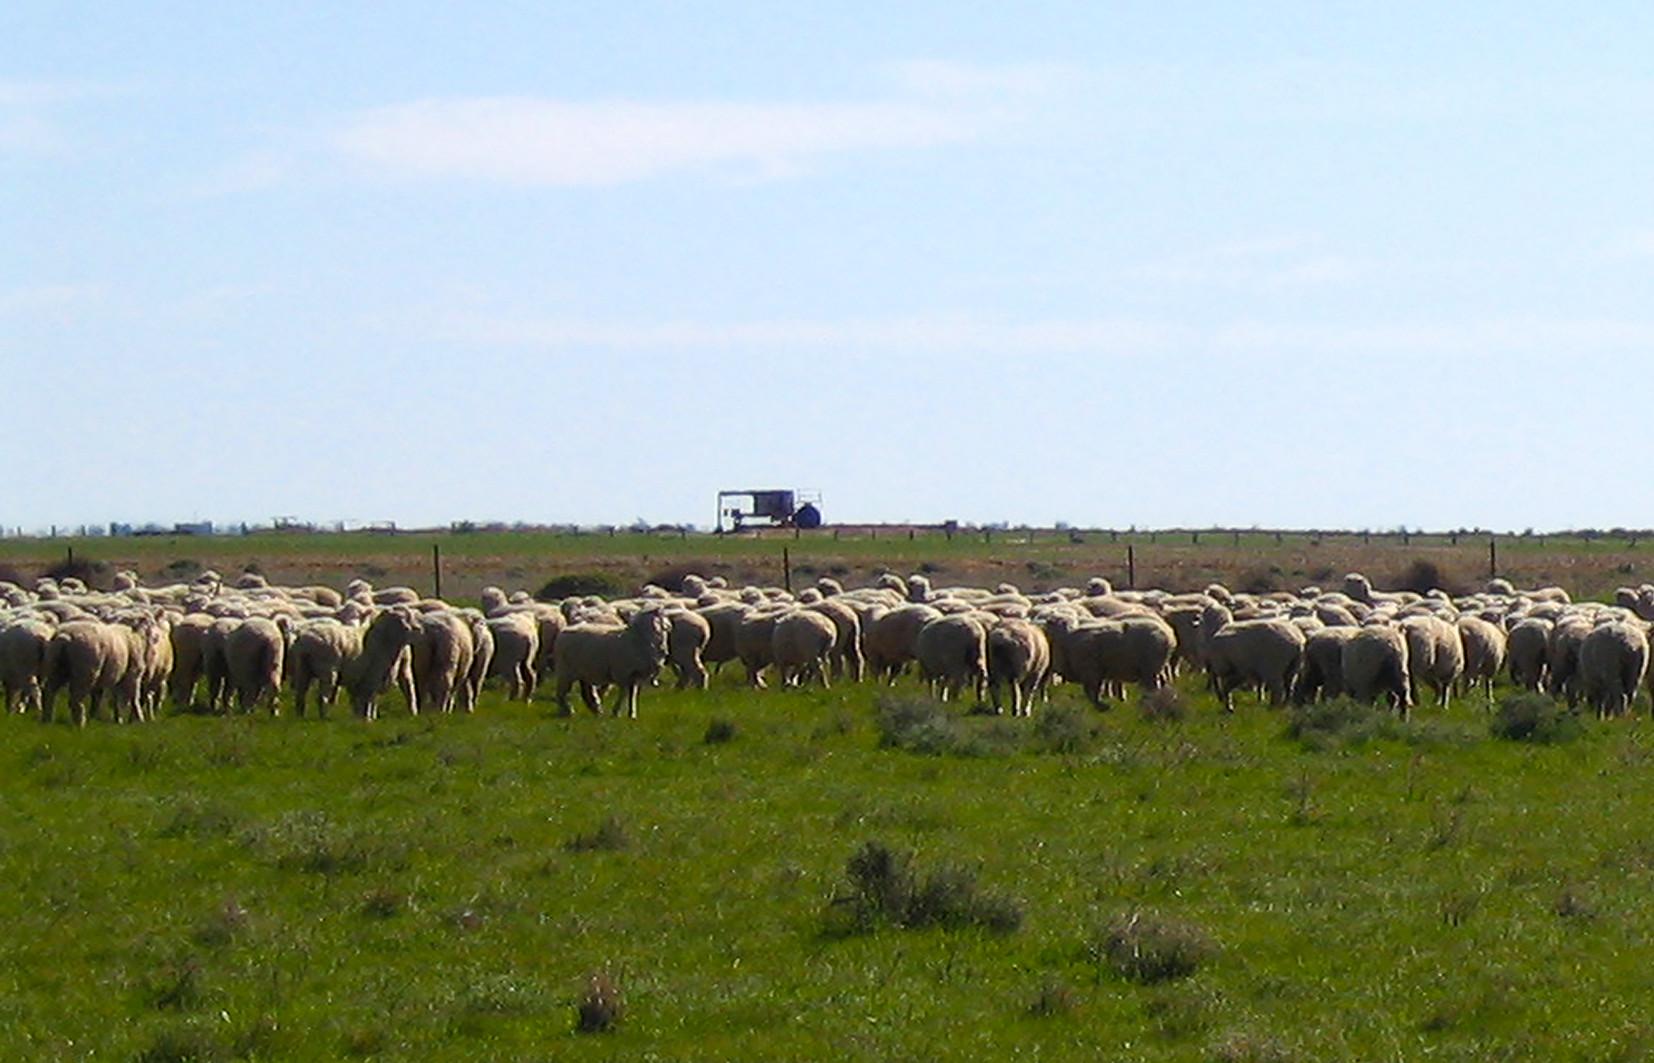 Sheep 2_Slider 6.jpg